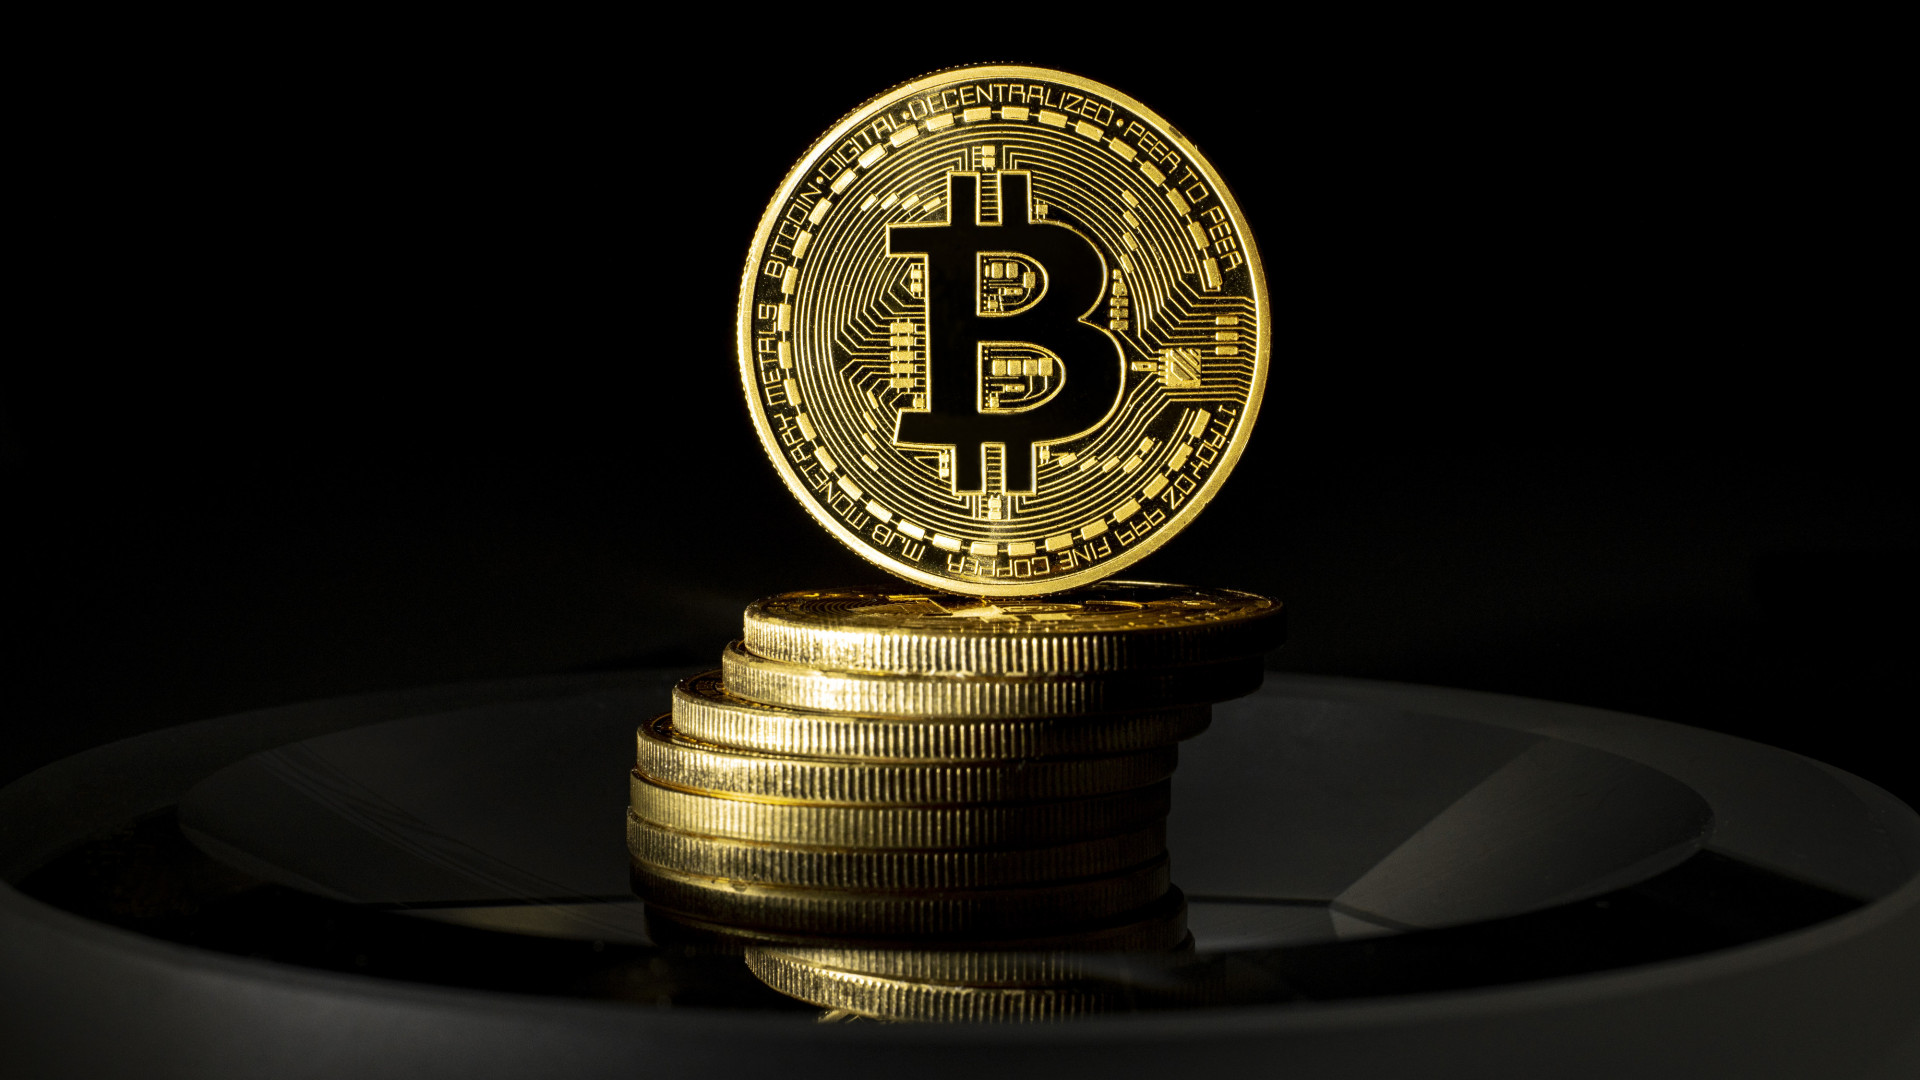 Kriptovaluta árfolyamok - BTC/HUF BitCoin Forint árfolyam, Etherum Forint árfolyam - kriptopénz